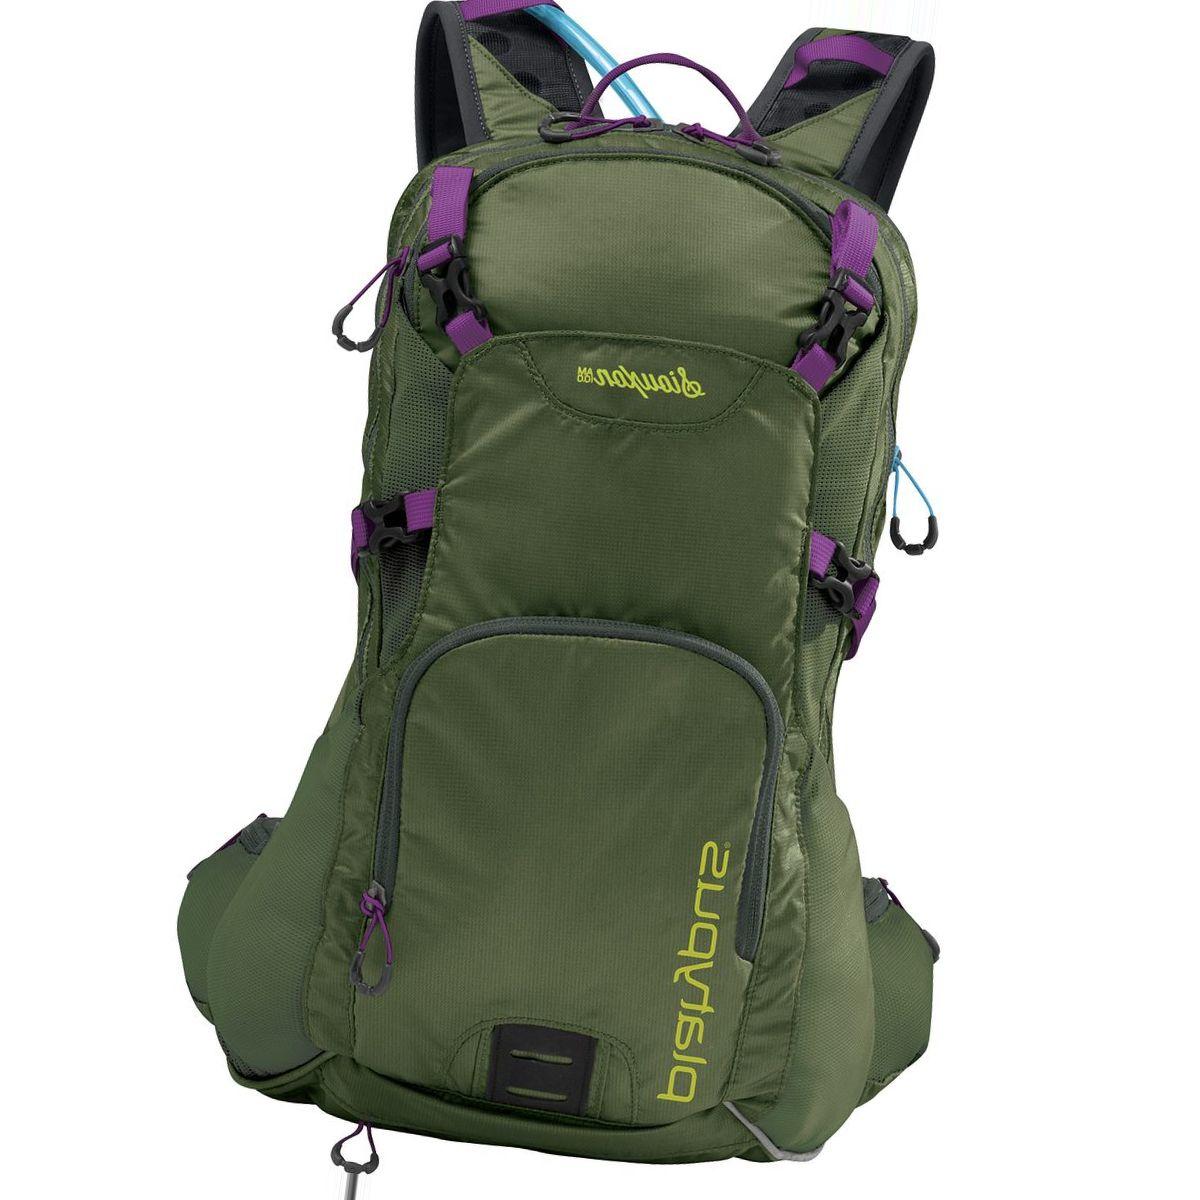 Platypus Siouxon 10L Backpack - Women's